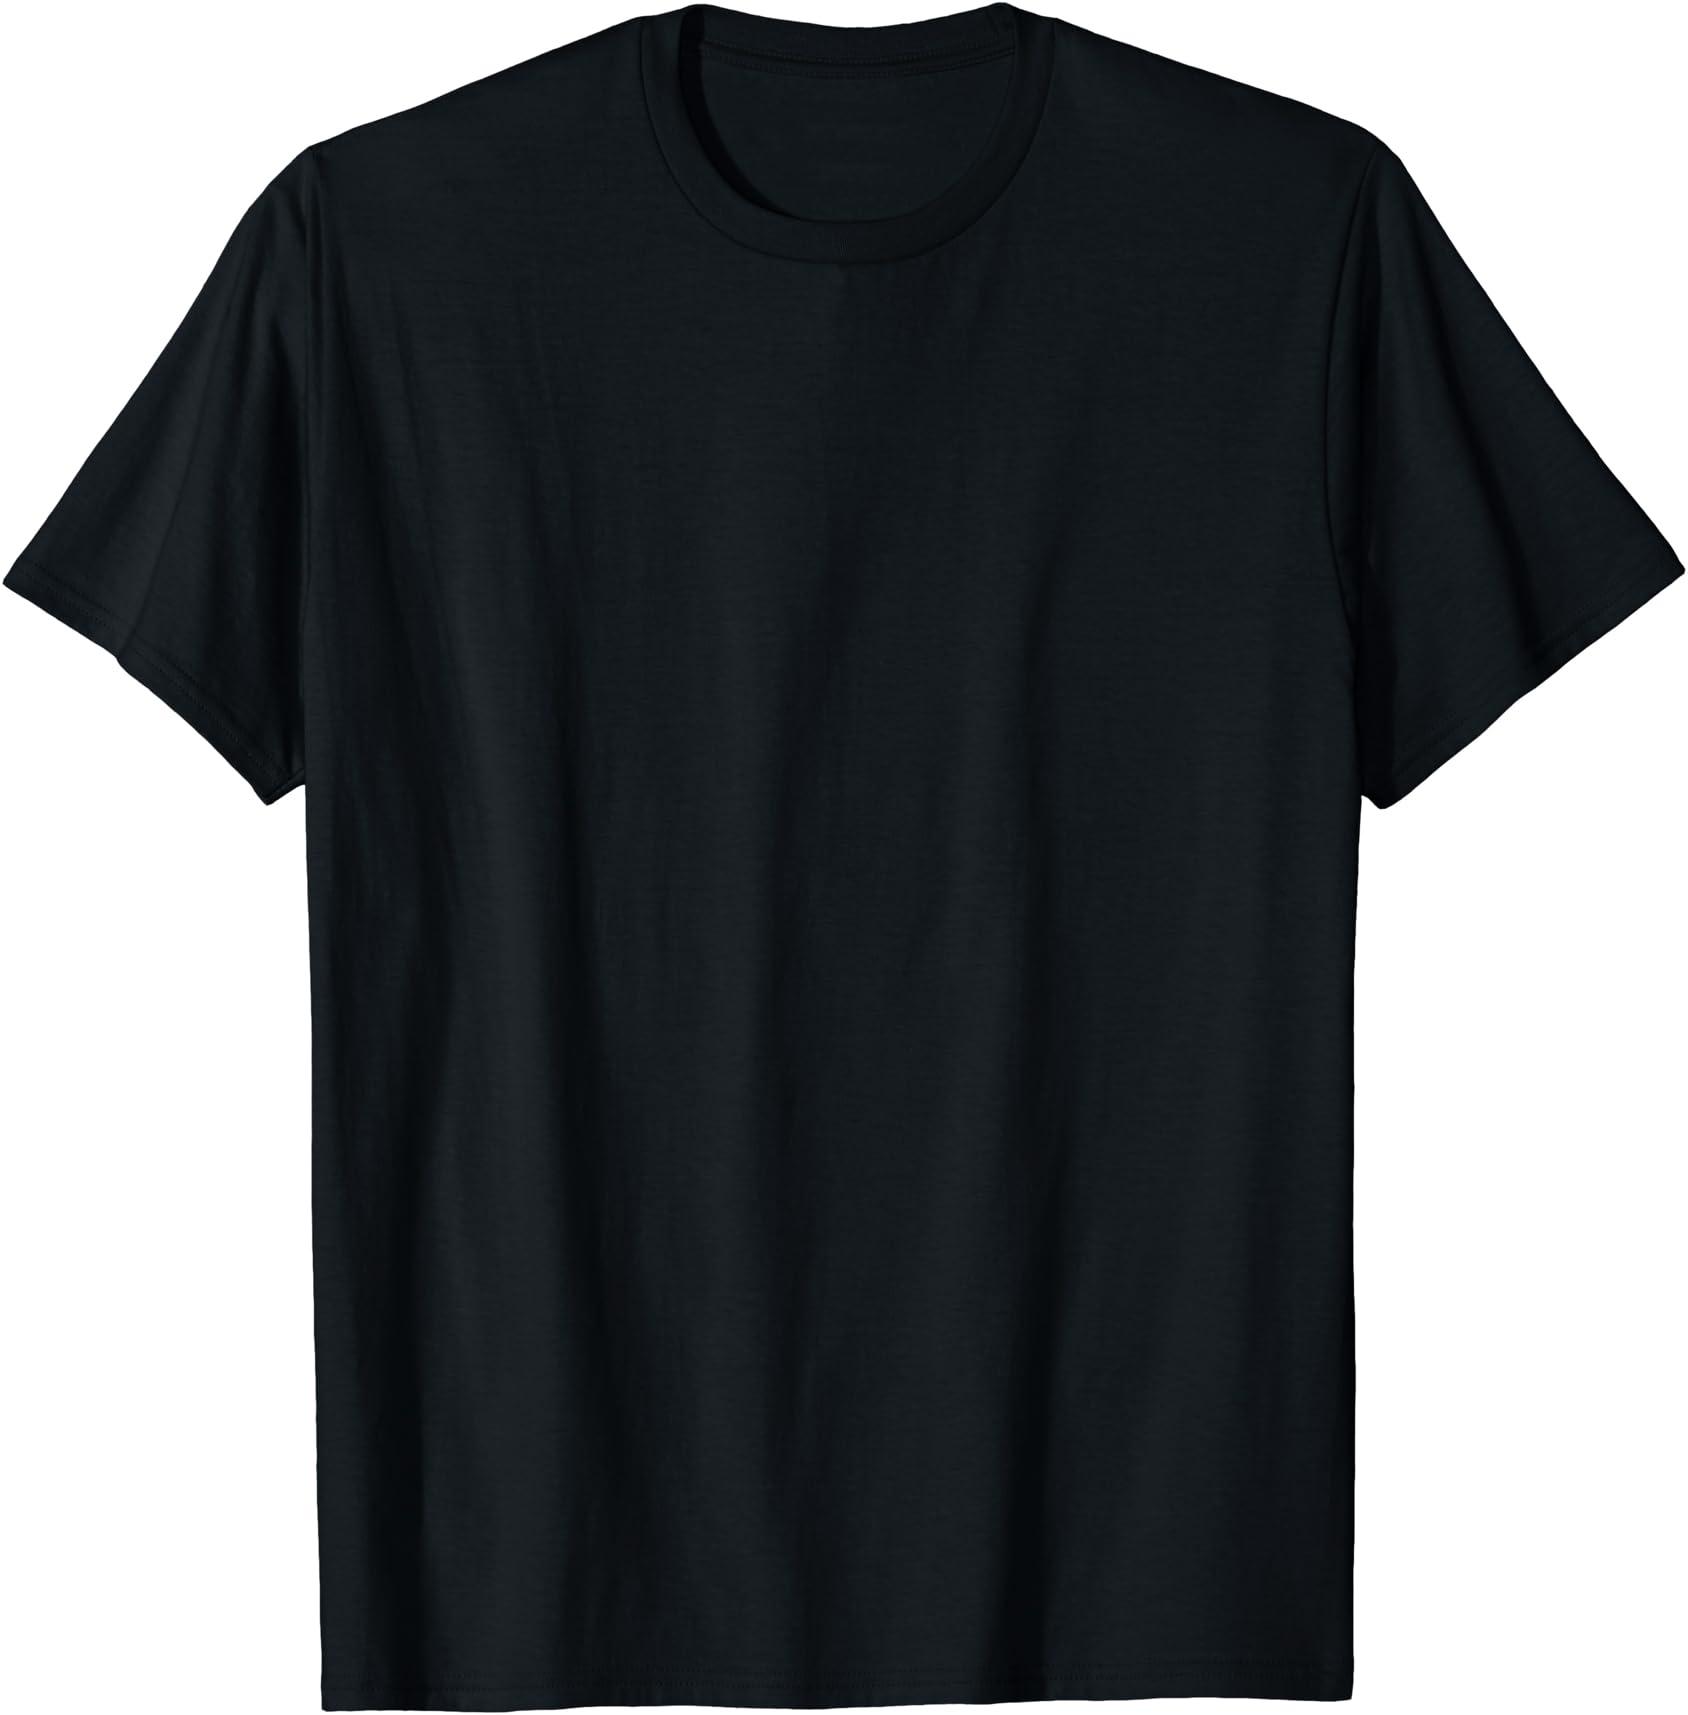 Herren T-ShirtFASCHING Comedy Shirts SWAT KOSTÜM